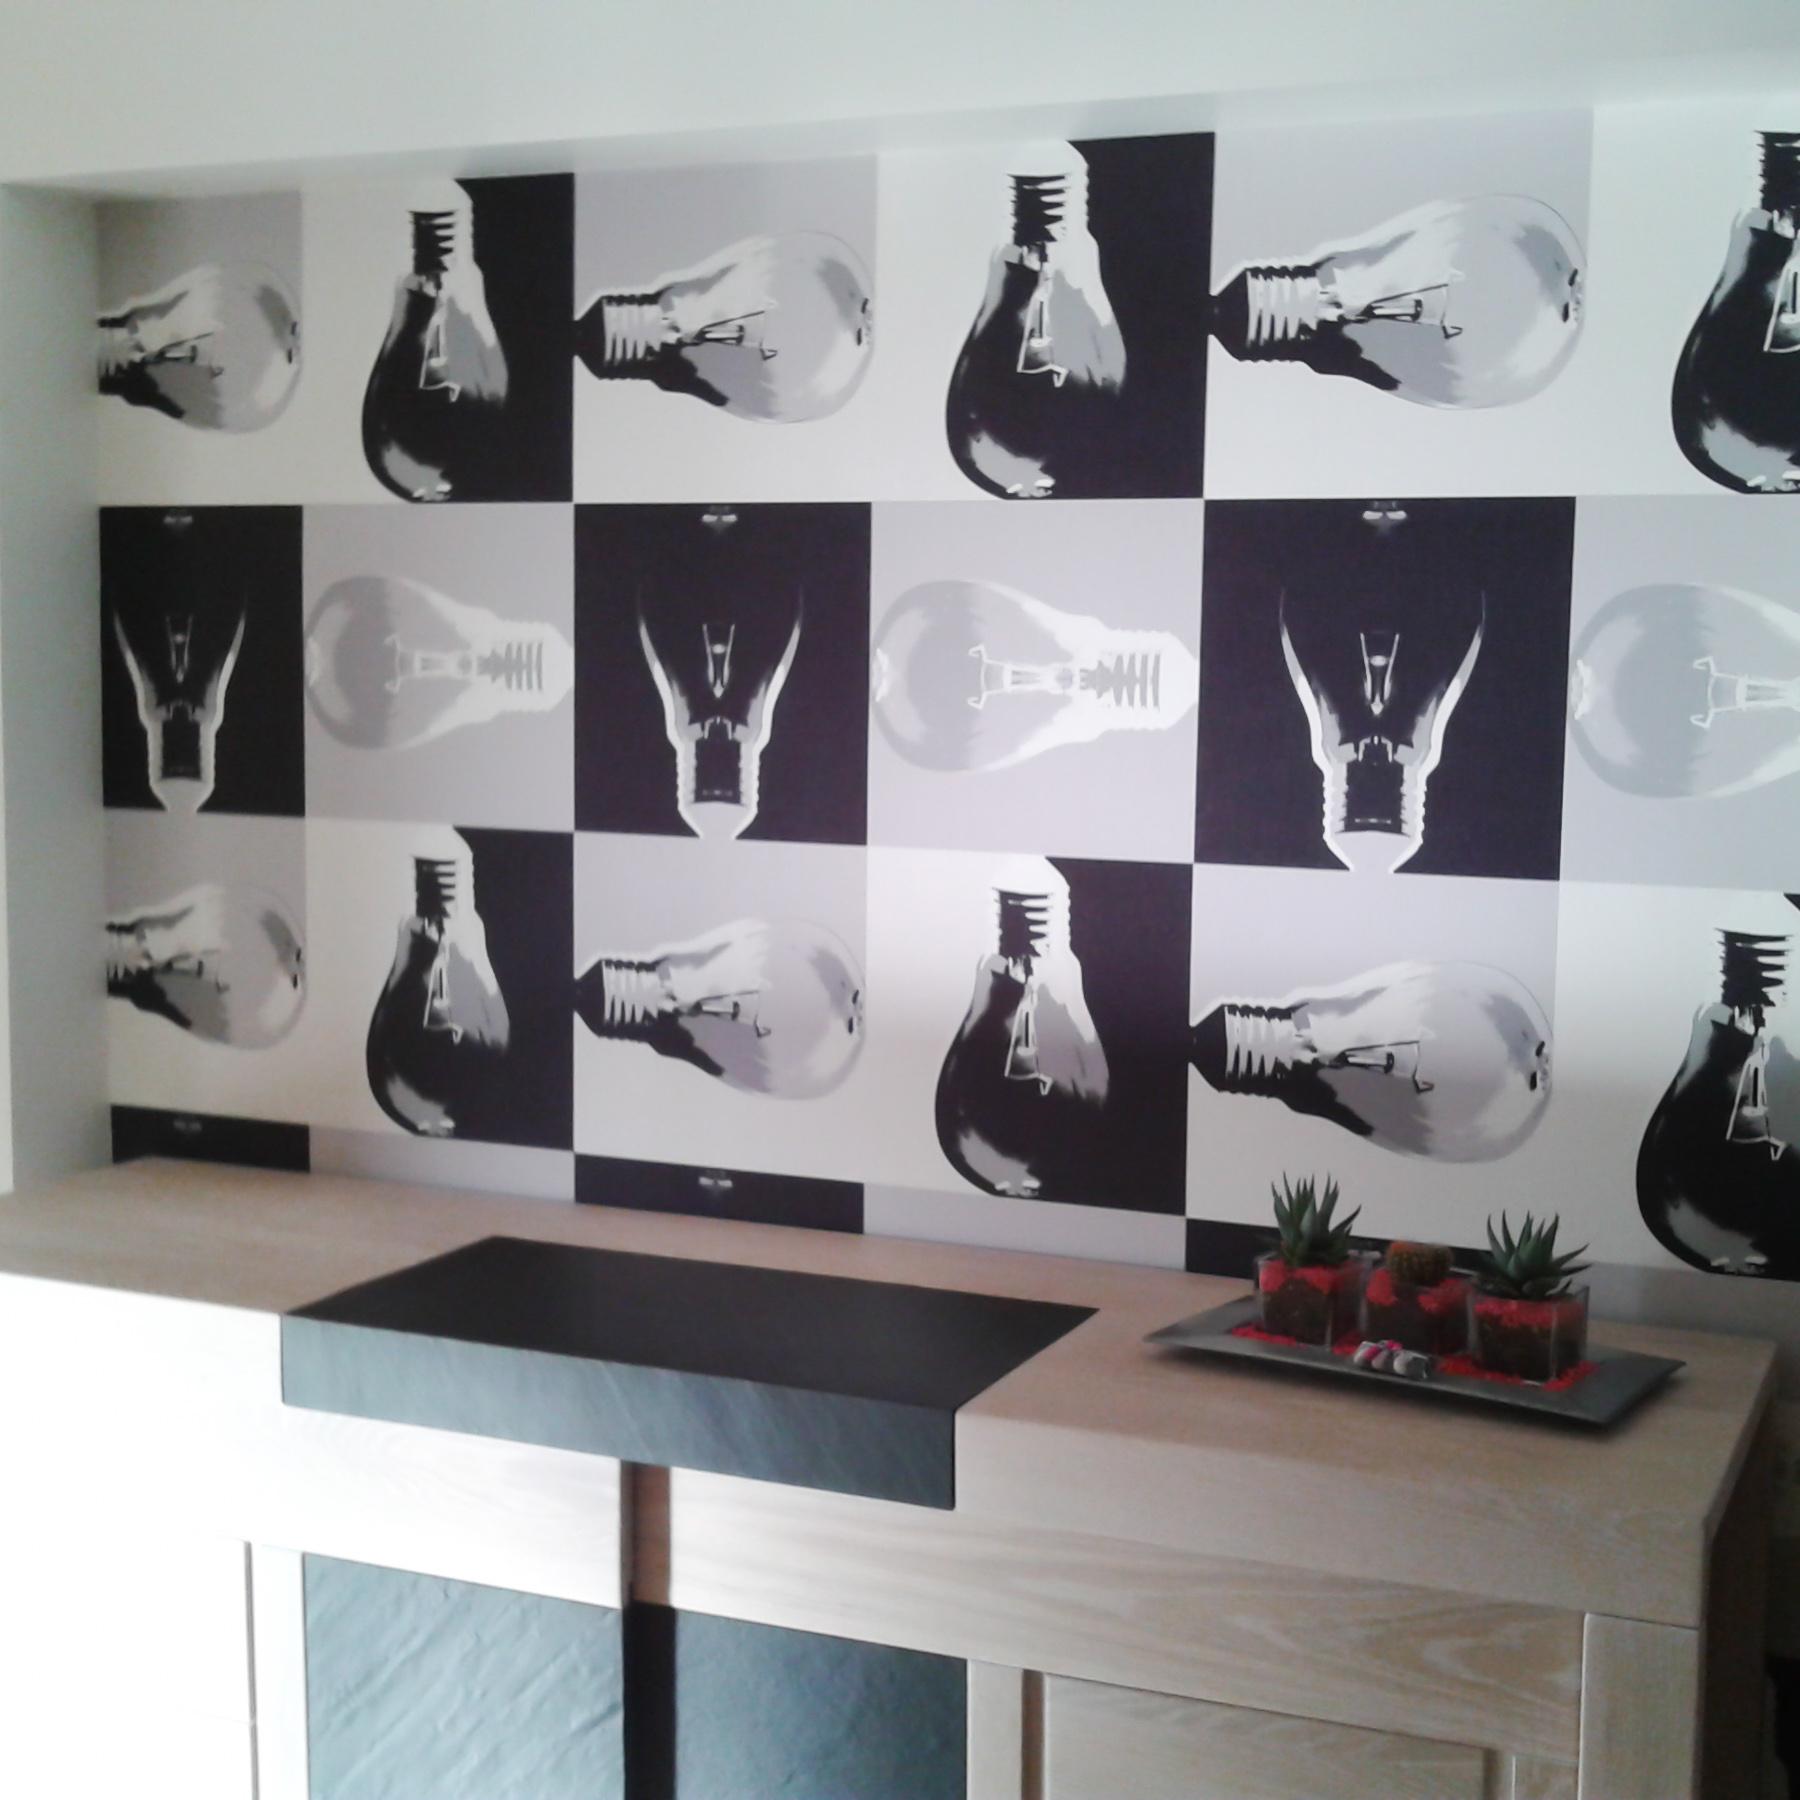 rev tement mural frederic tron. Black Bedroom Furniture Sets. Home Design Ideas